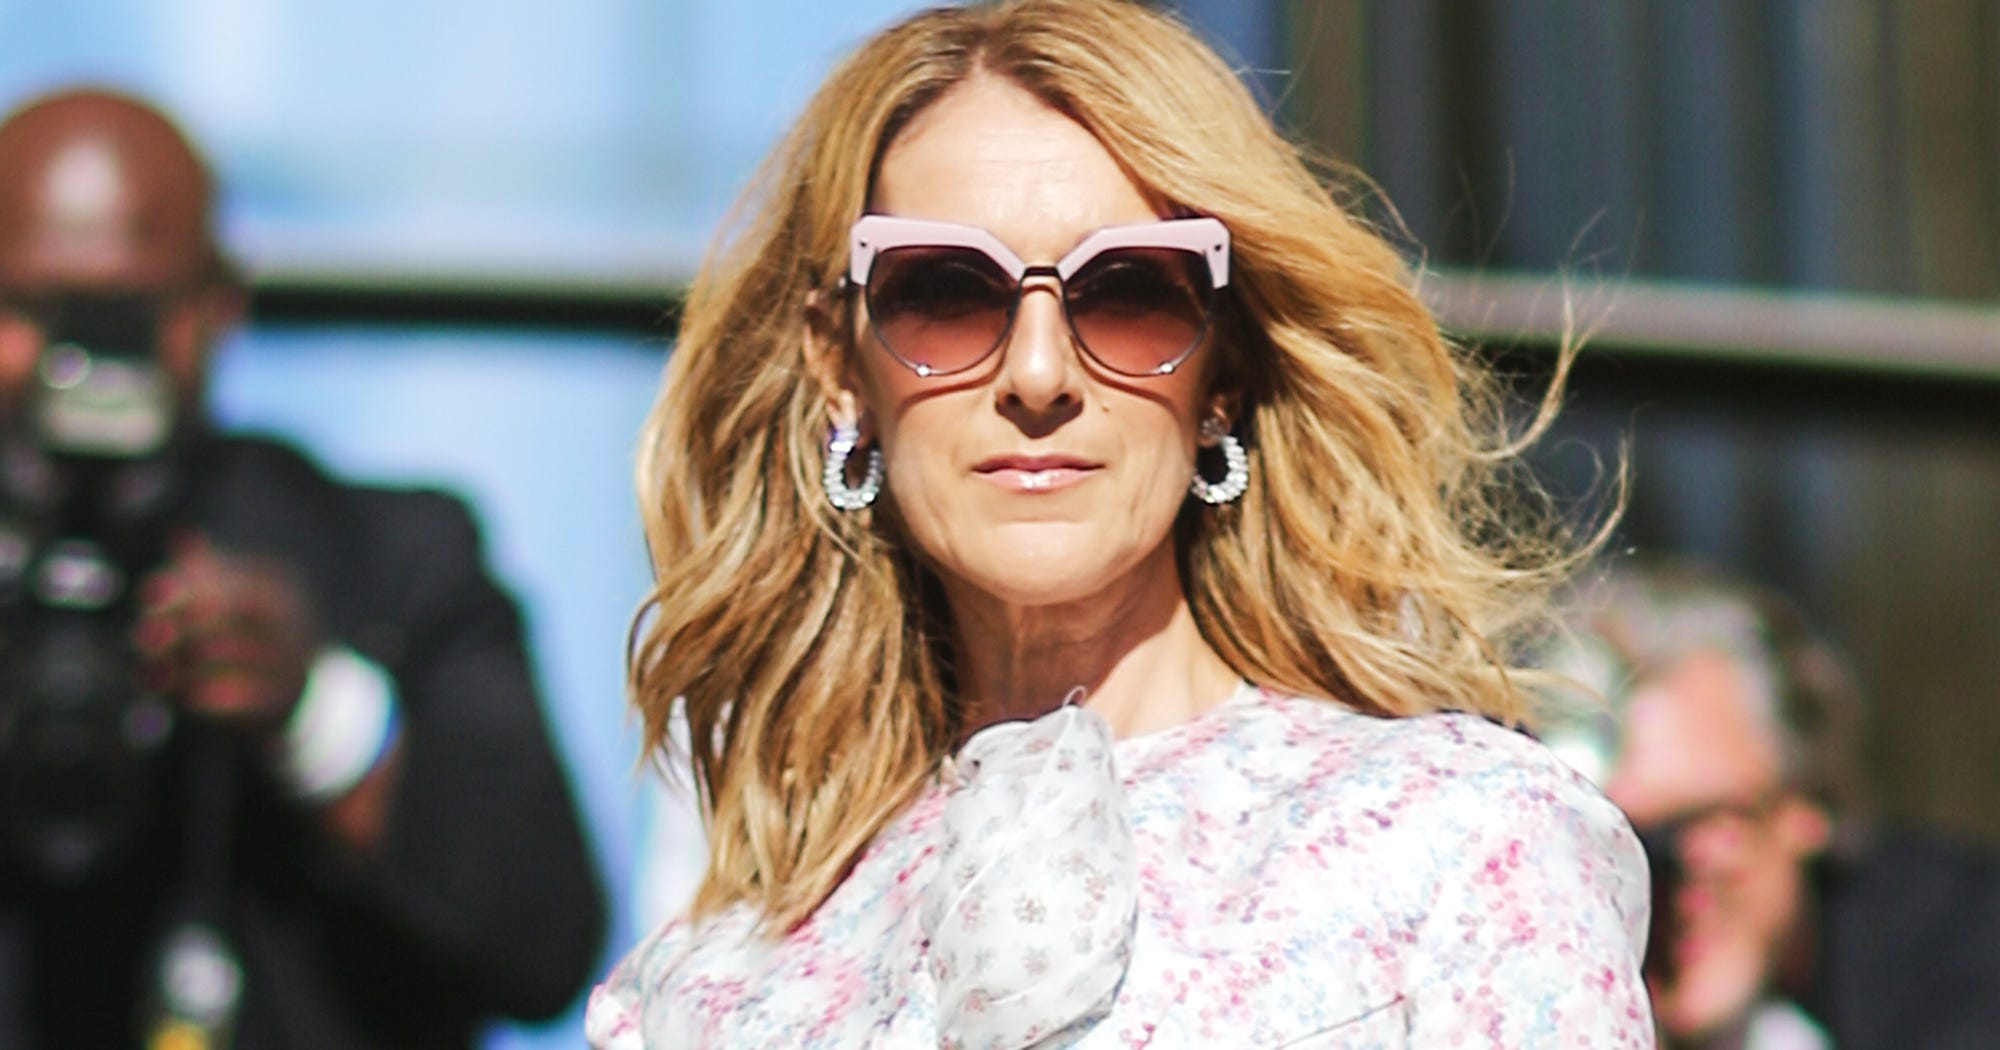 Celine Dion Vogue Instagram Marie Antoinette Looks